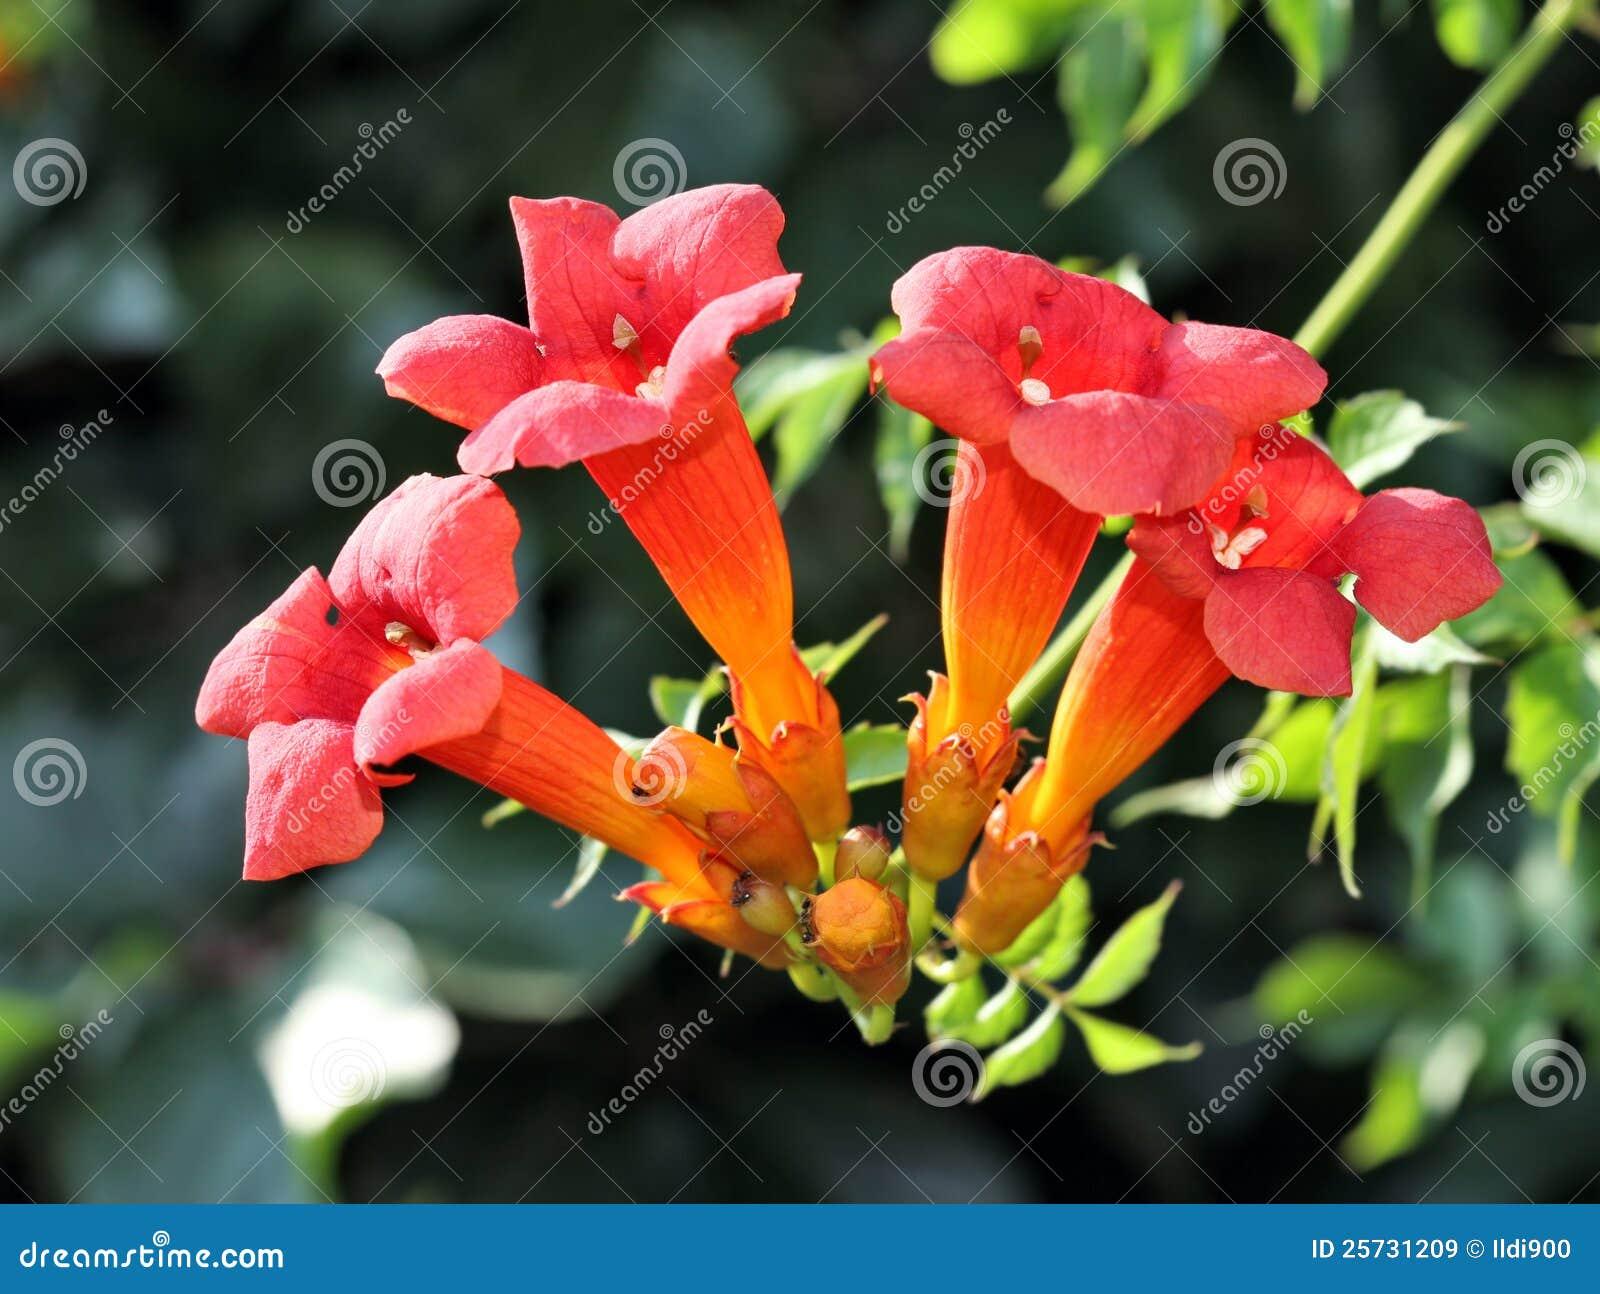 Trumpet vine flowers.